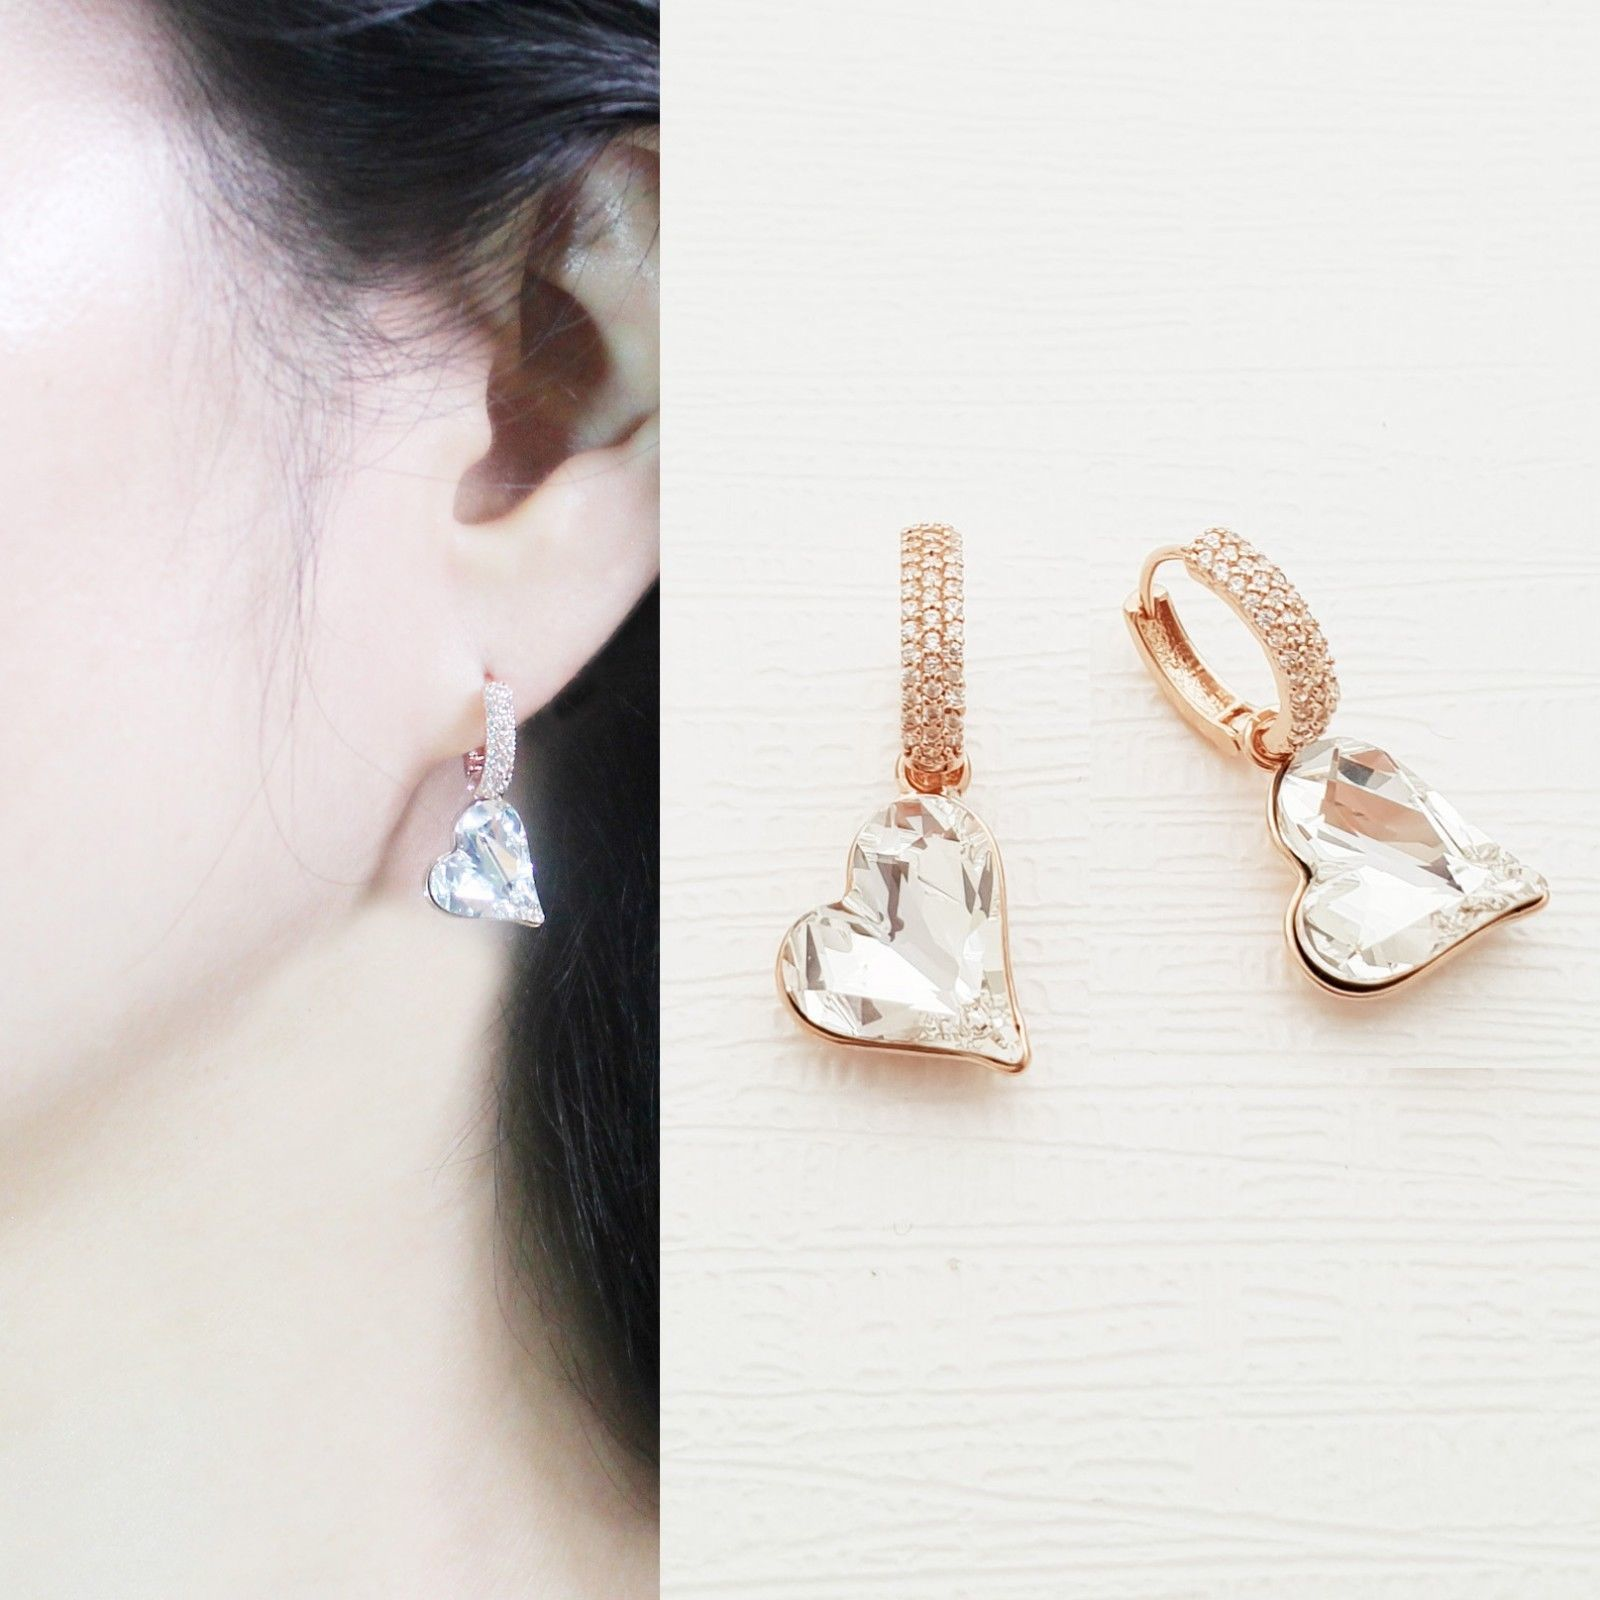 Heart Made With Swarovski Crystal Laverback Dangle Earrings Cubic Zirconia E215